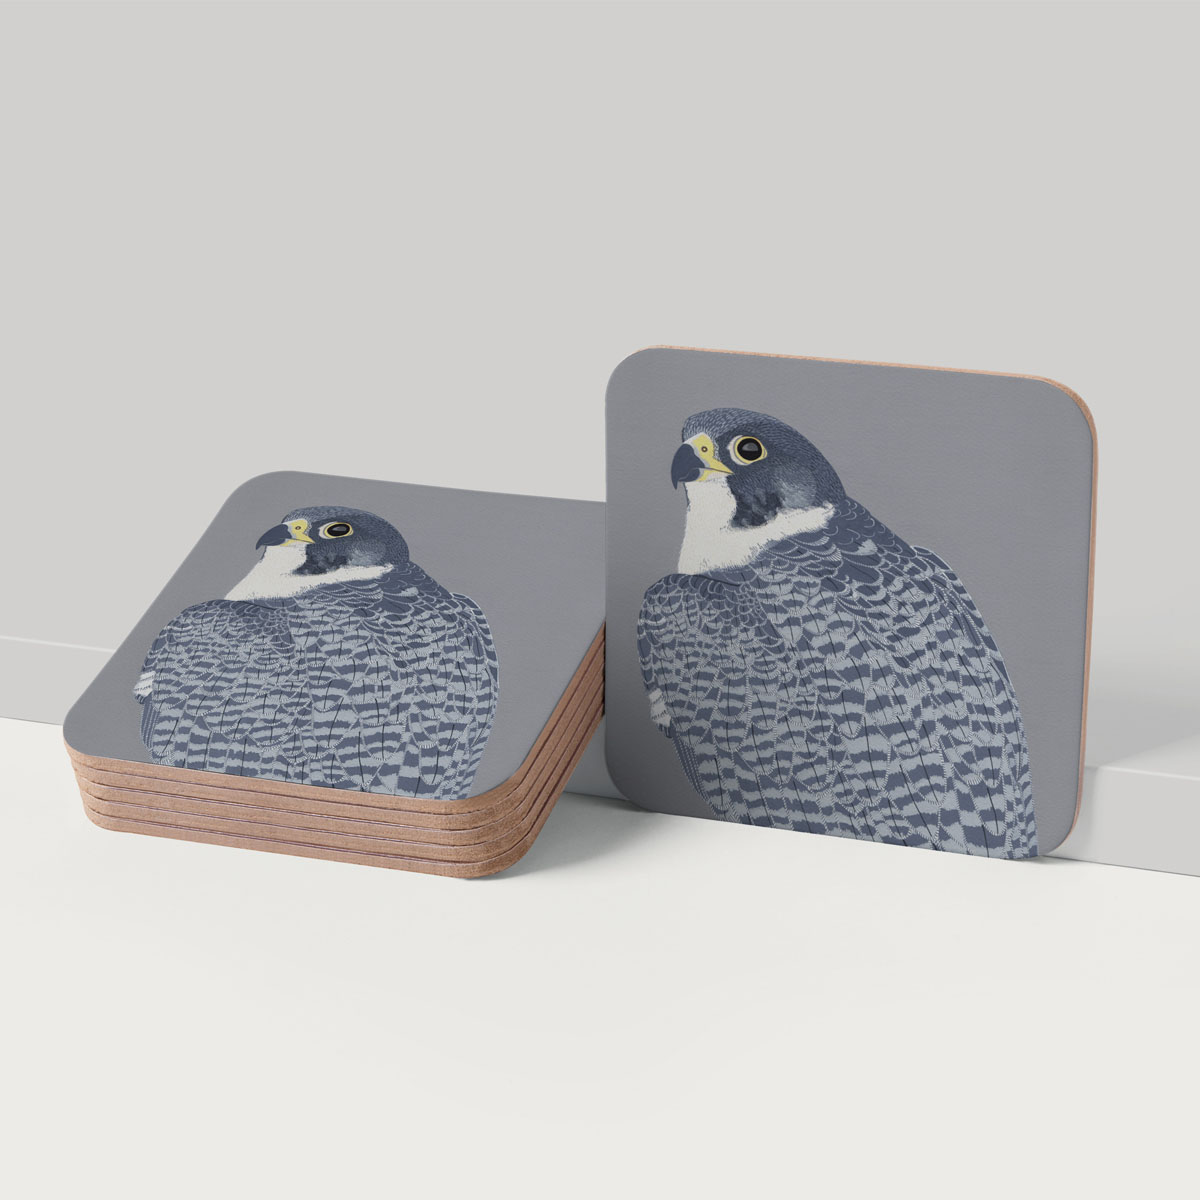 Peregrine Placemat Coaster Homewares